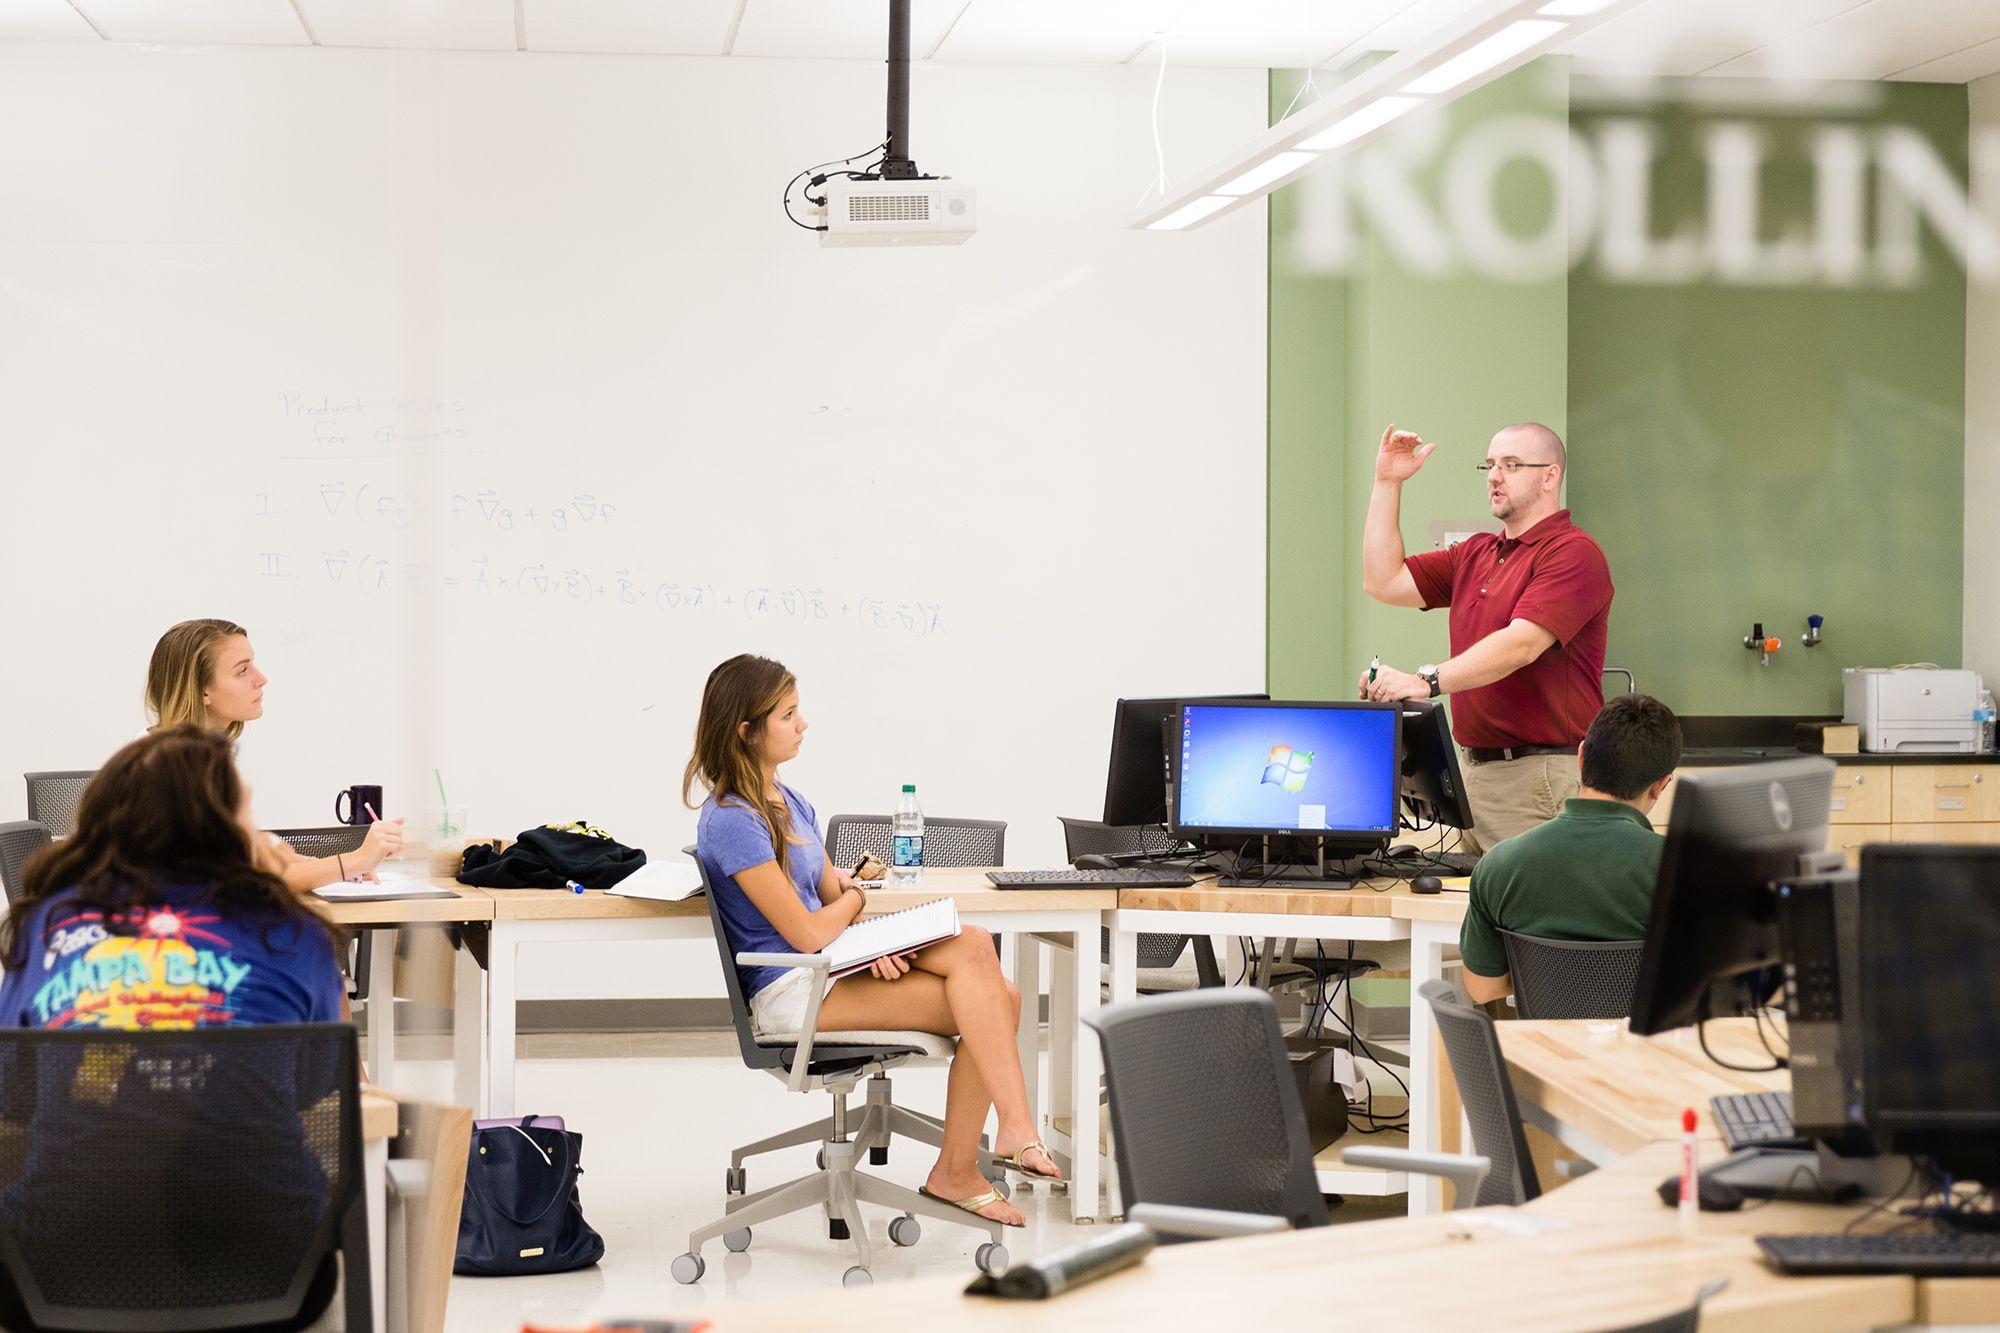 Physics professor Chris Fuse explains concepts in class.